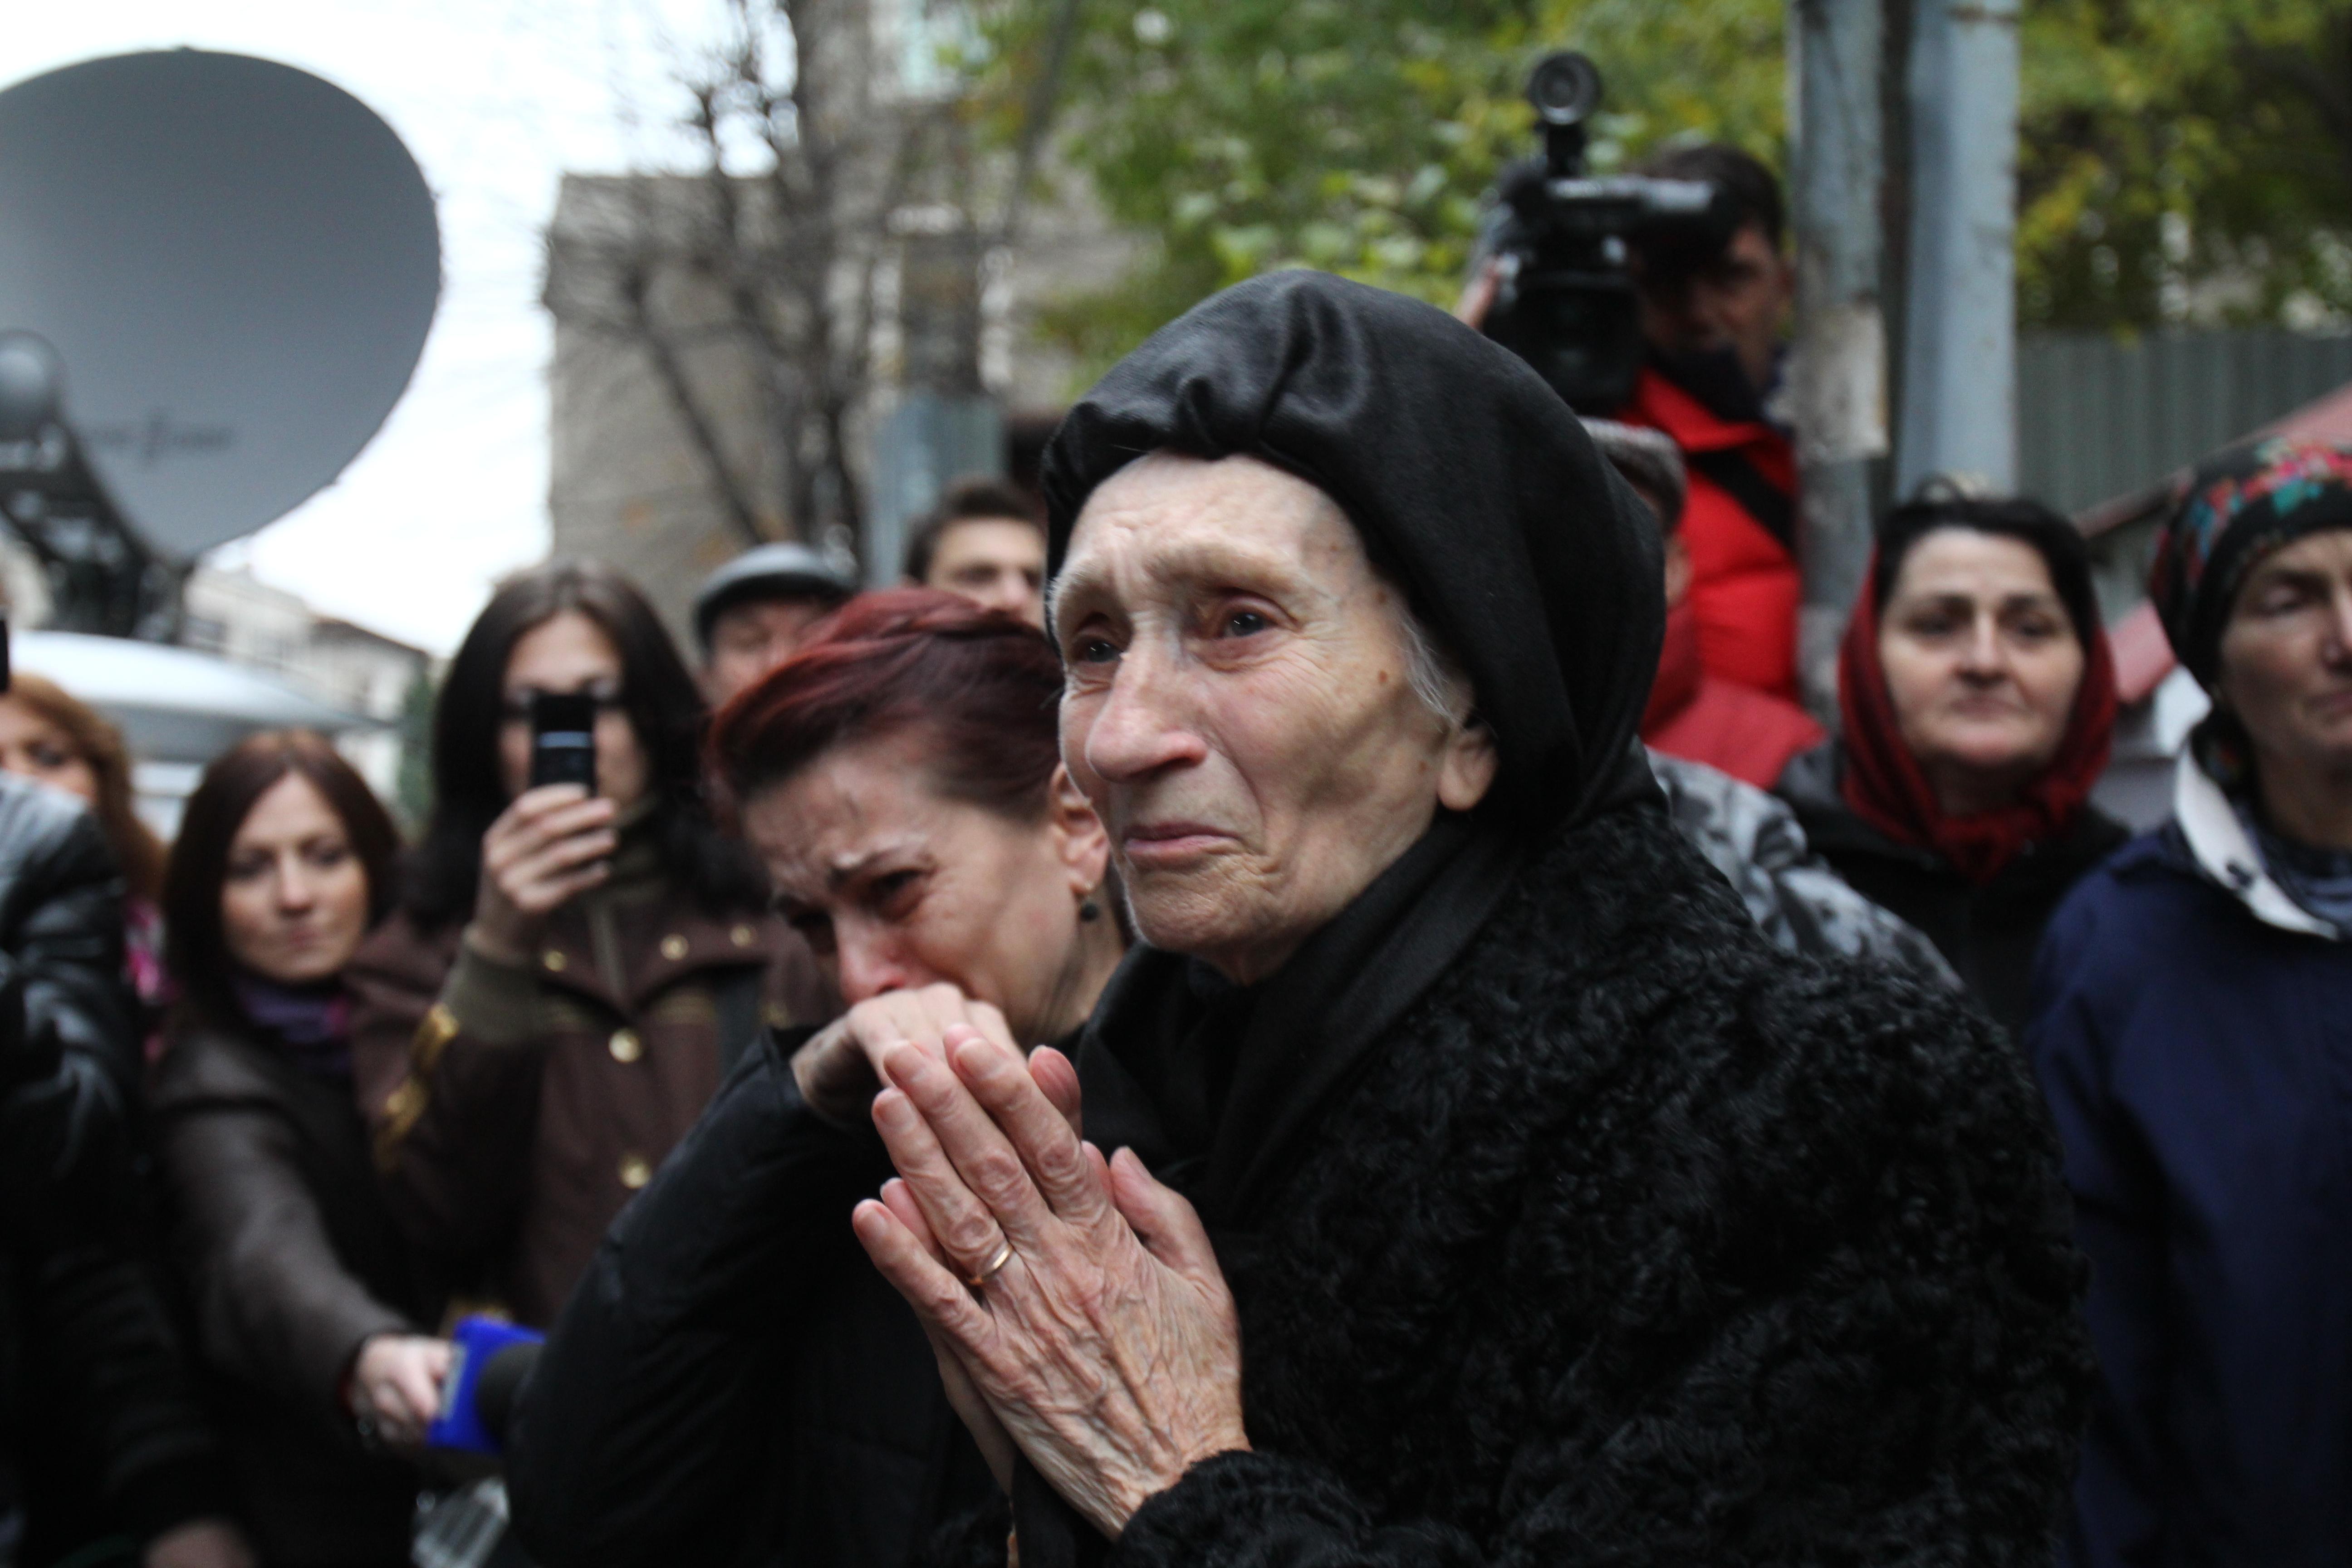 Mama lui Serban Ionescu, monument de durere in ziua in care si-a inmormantat fiul